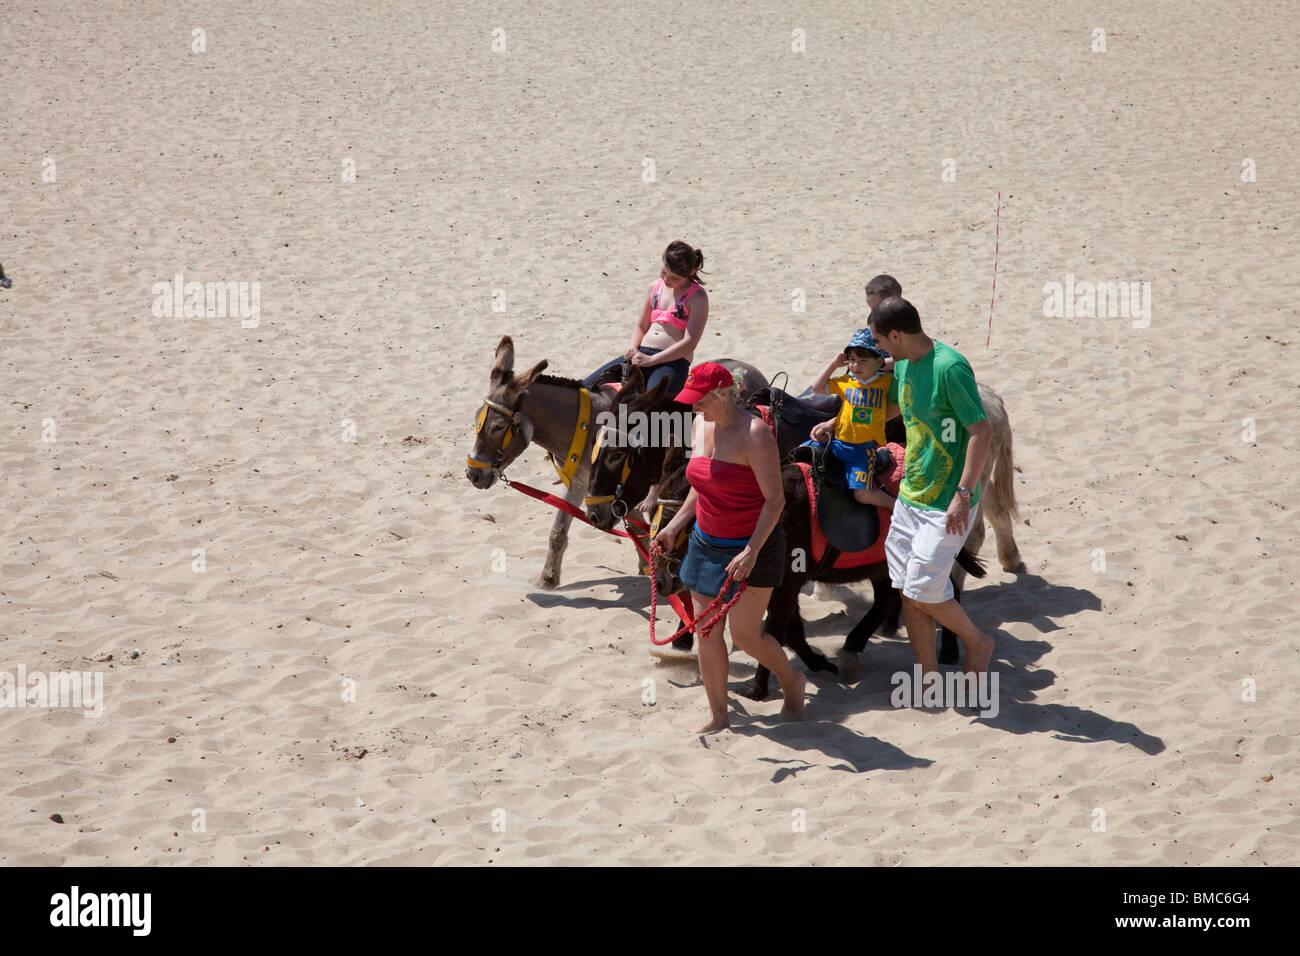 Donkeys on beach Gt Yarmouth Norfolk Stock Photo